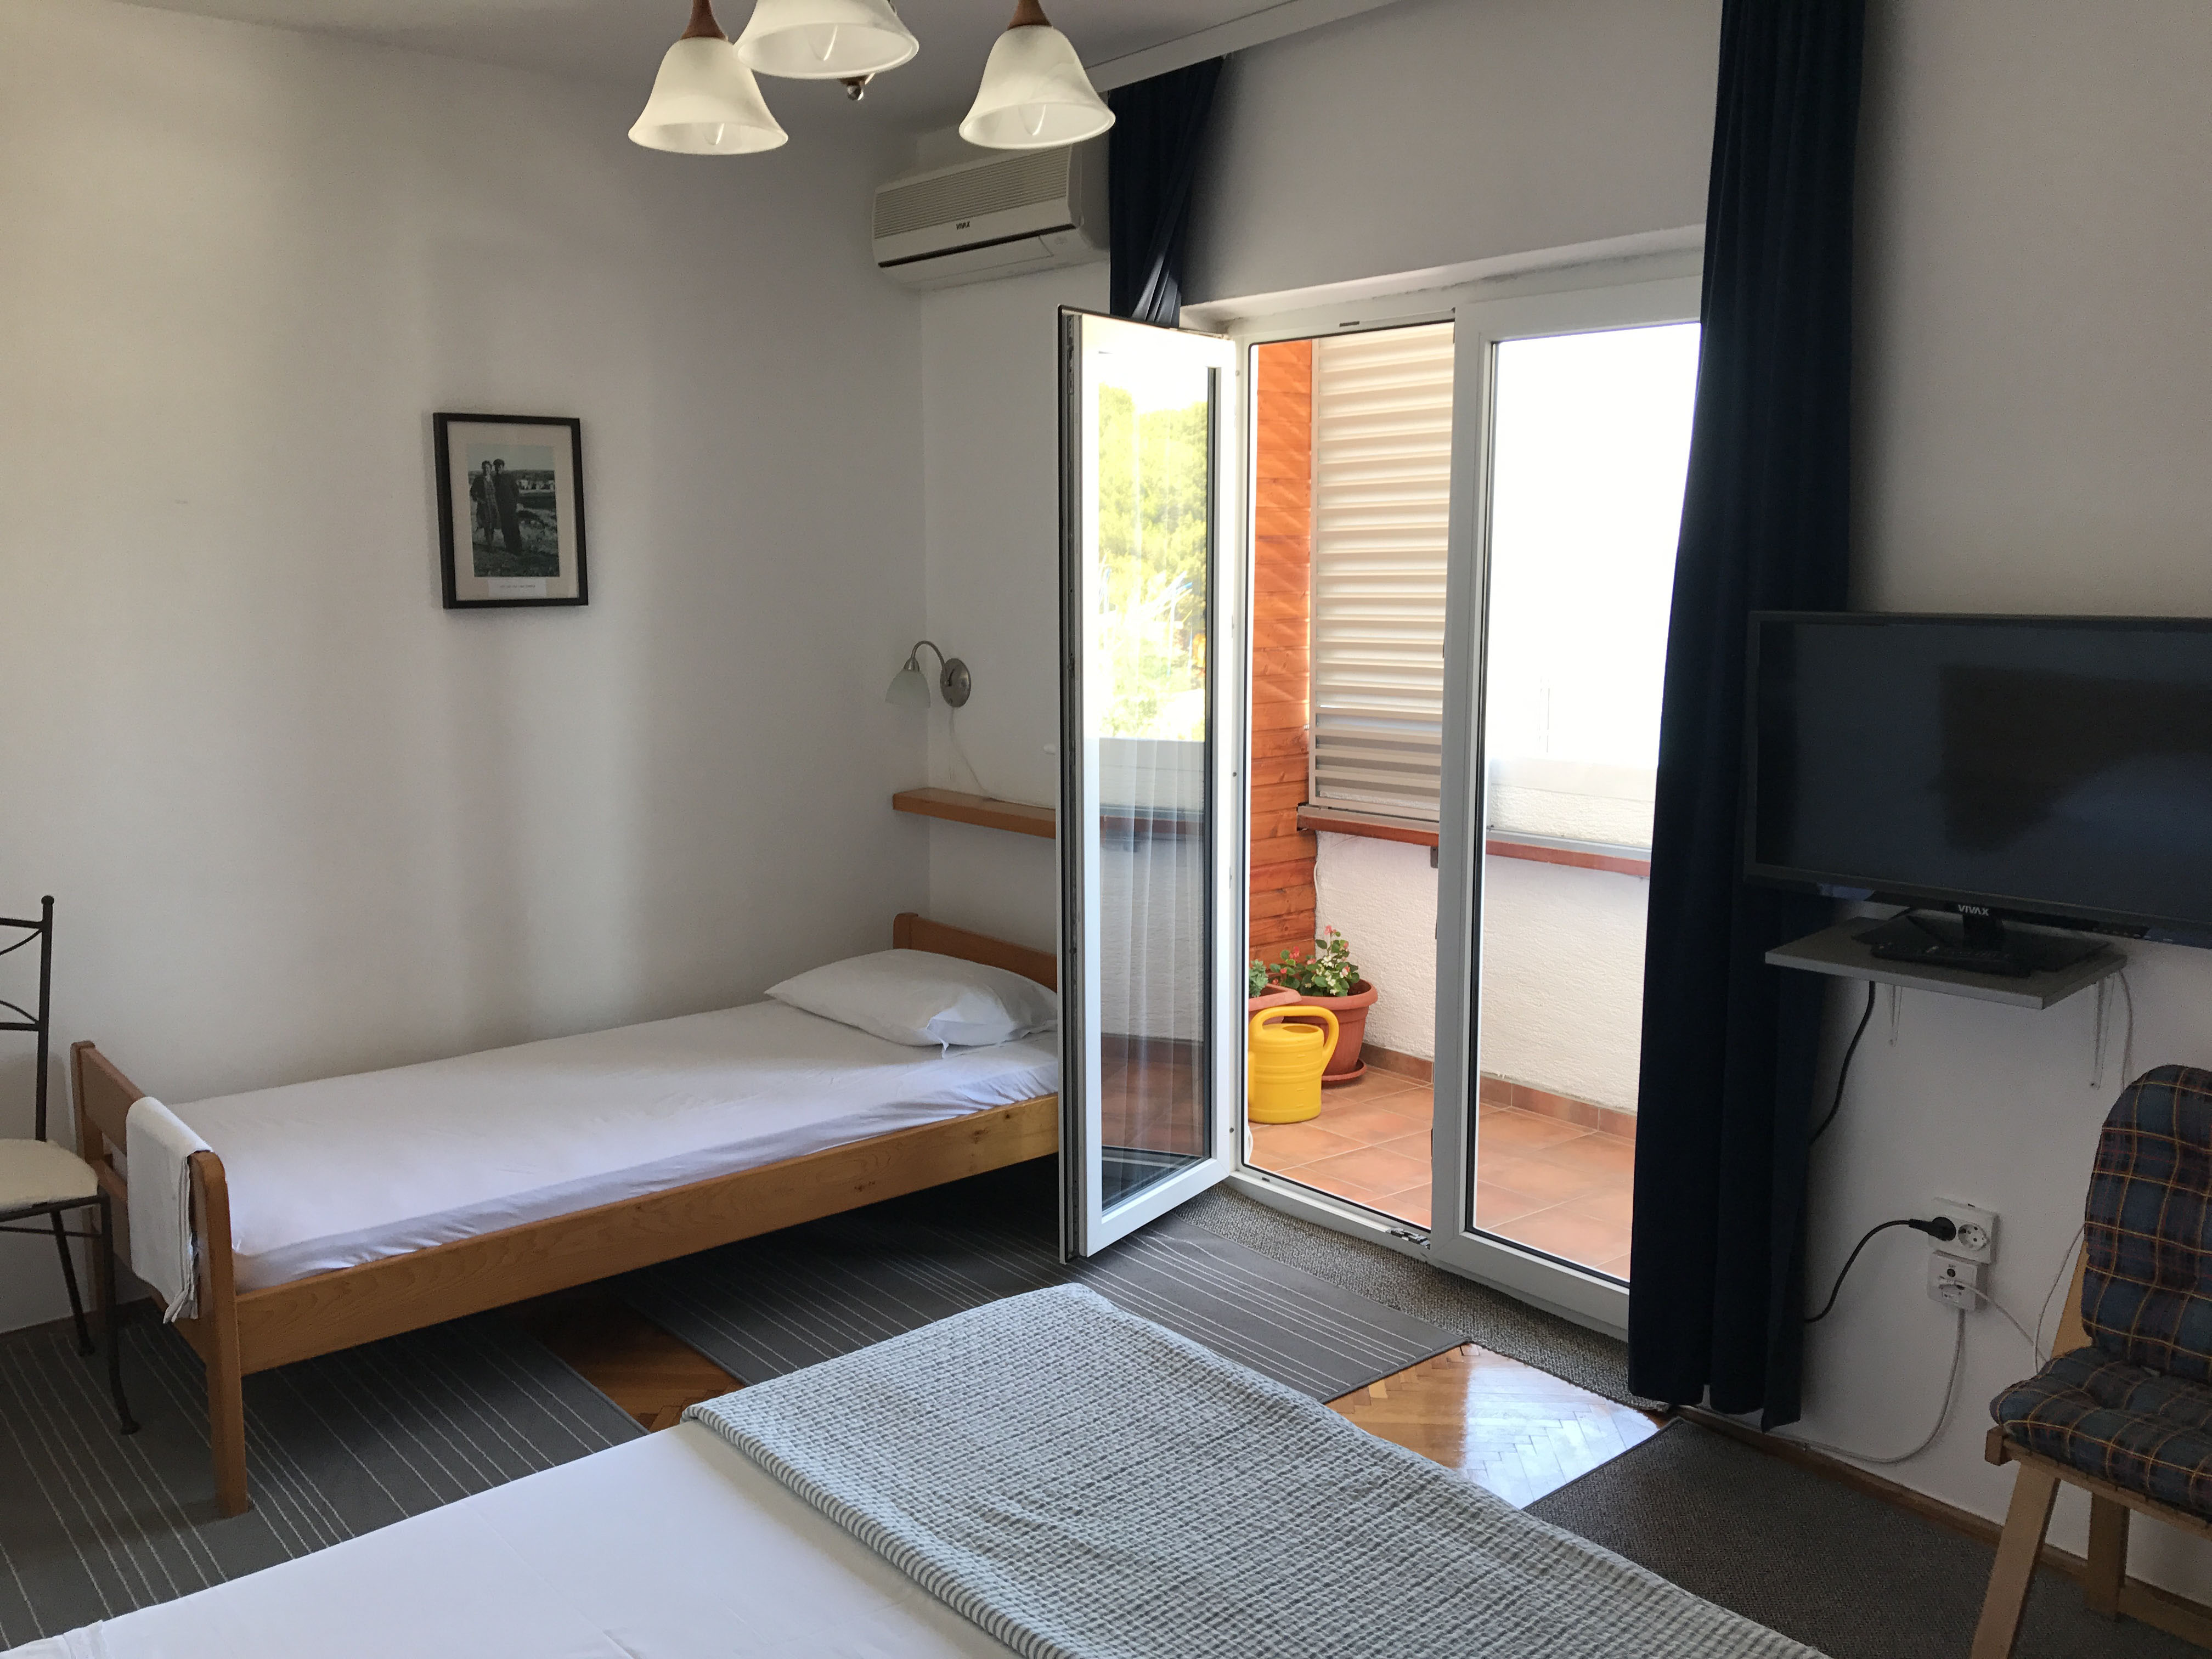 bedroom-in-apartment-2